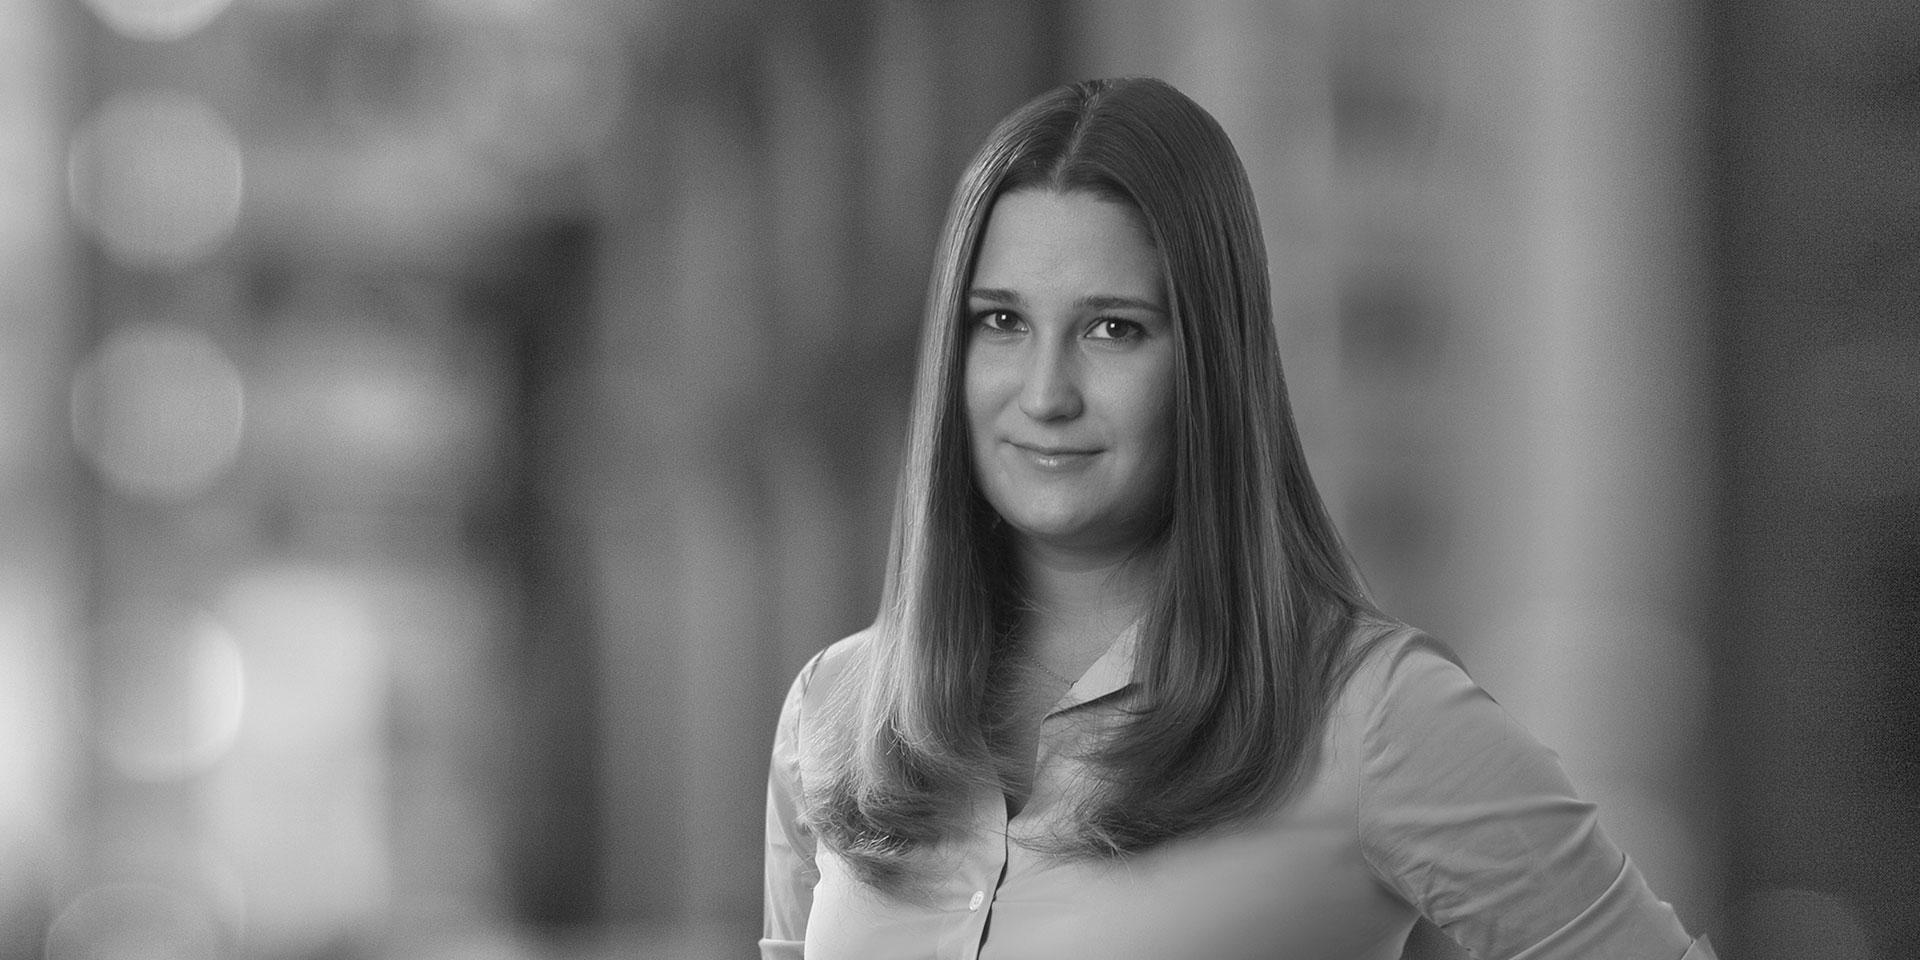 Anastasia Seliankina